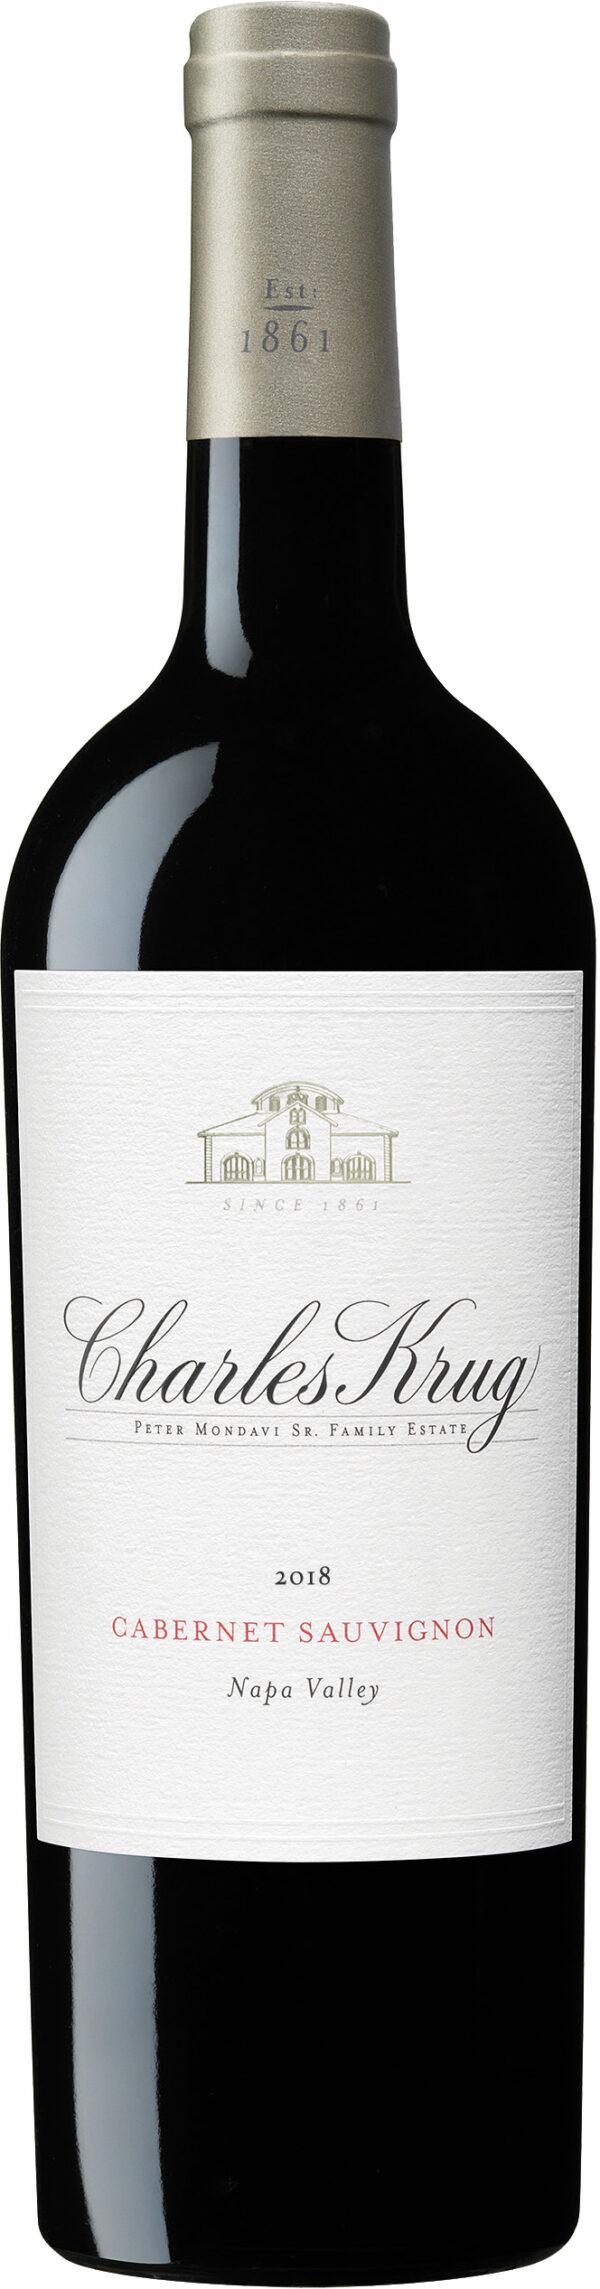 Charles Krug - Napa Valley Cabernet Sauvignon 2018 75cl Bottle